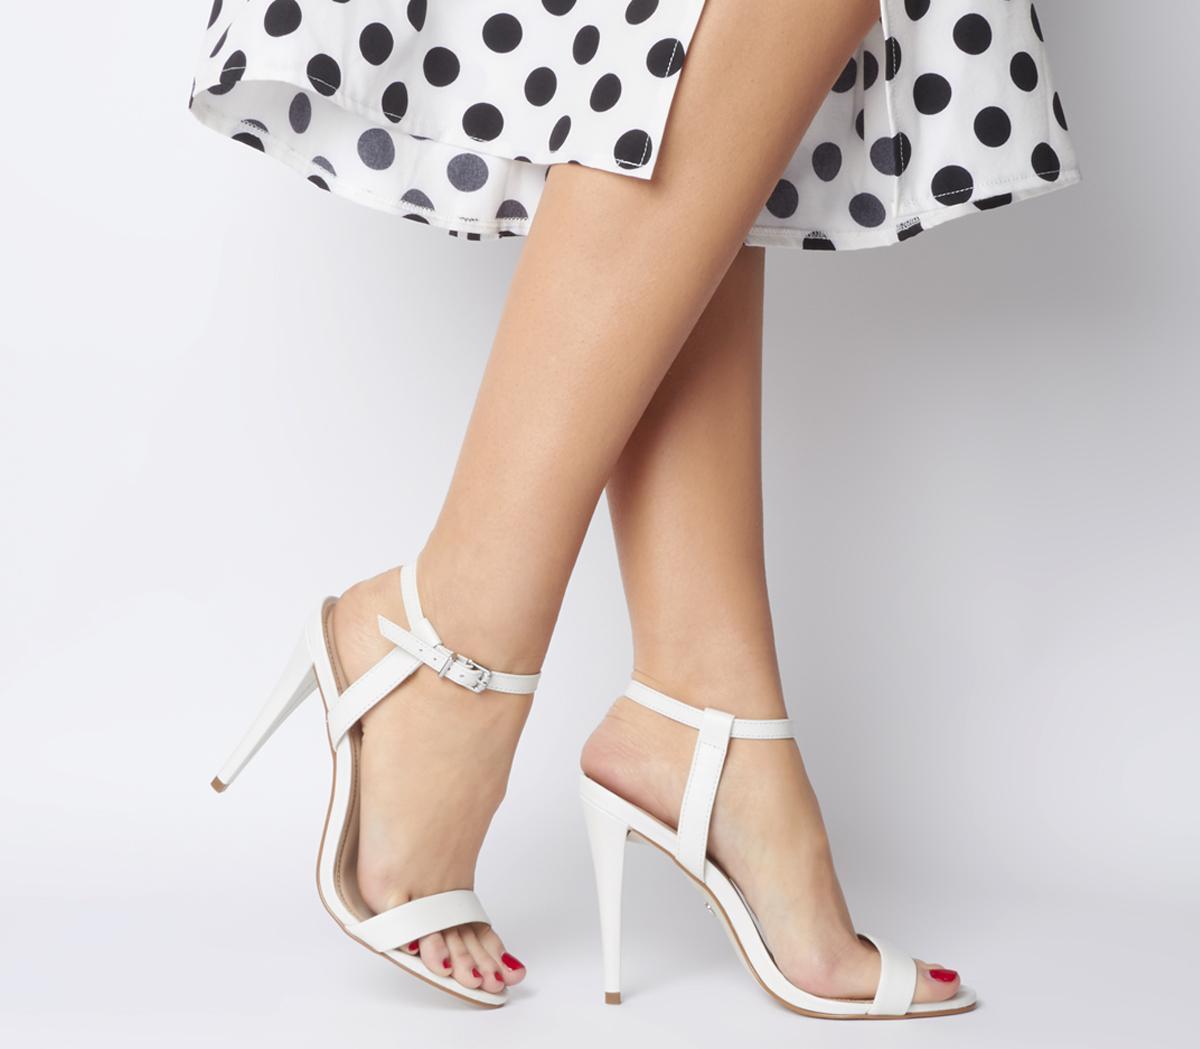 Hotness Heeled Sandals